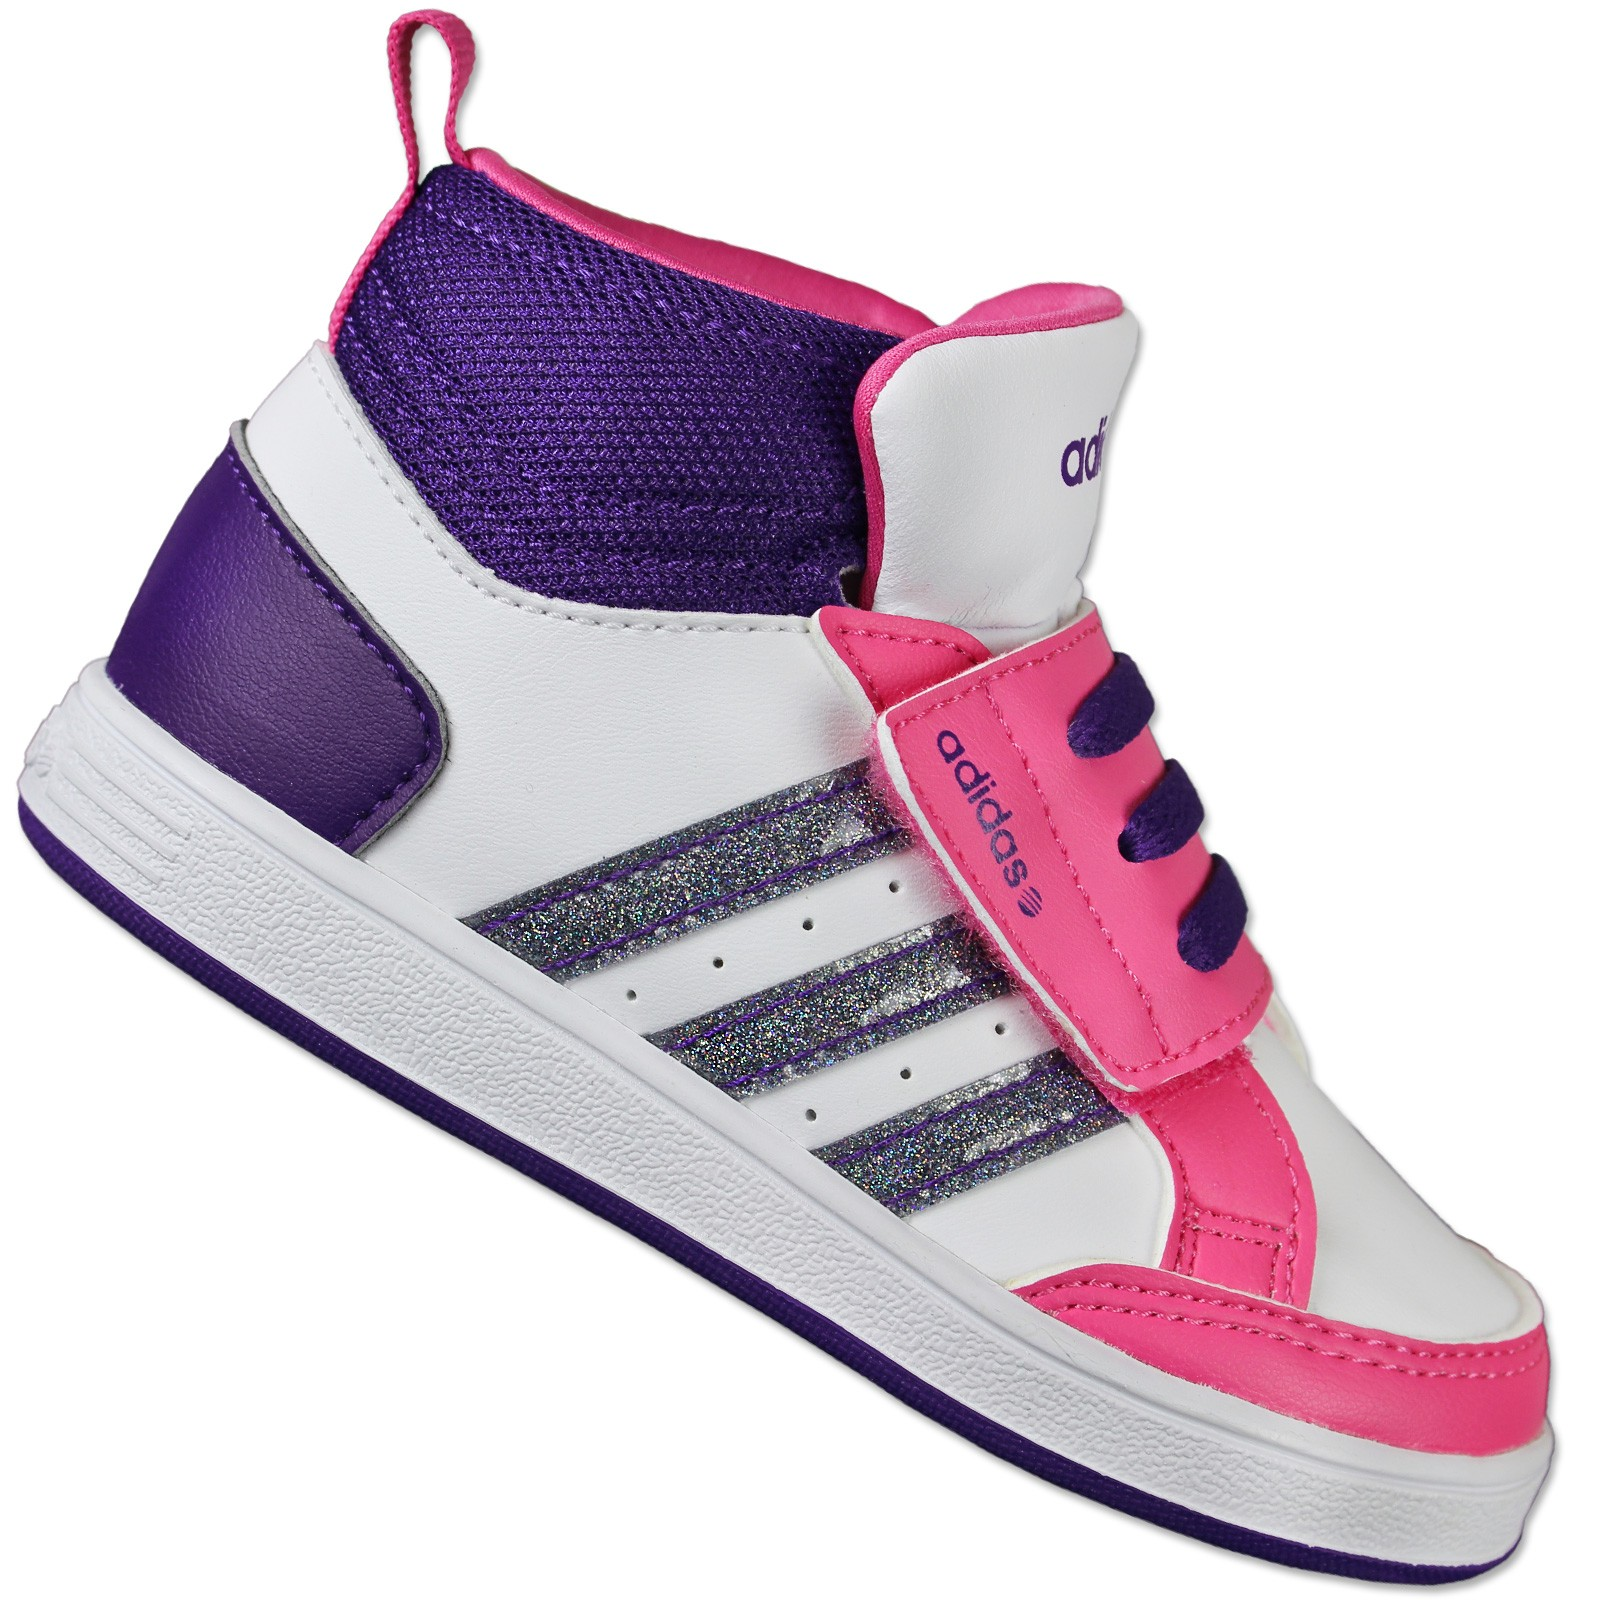 ADIDAS NEO HOOPS CMF Mid Babyschuhe Kinder Schuhe F98535